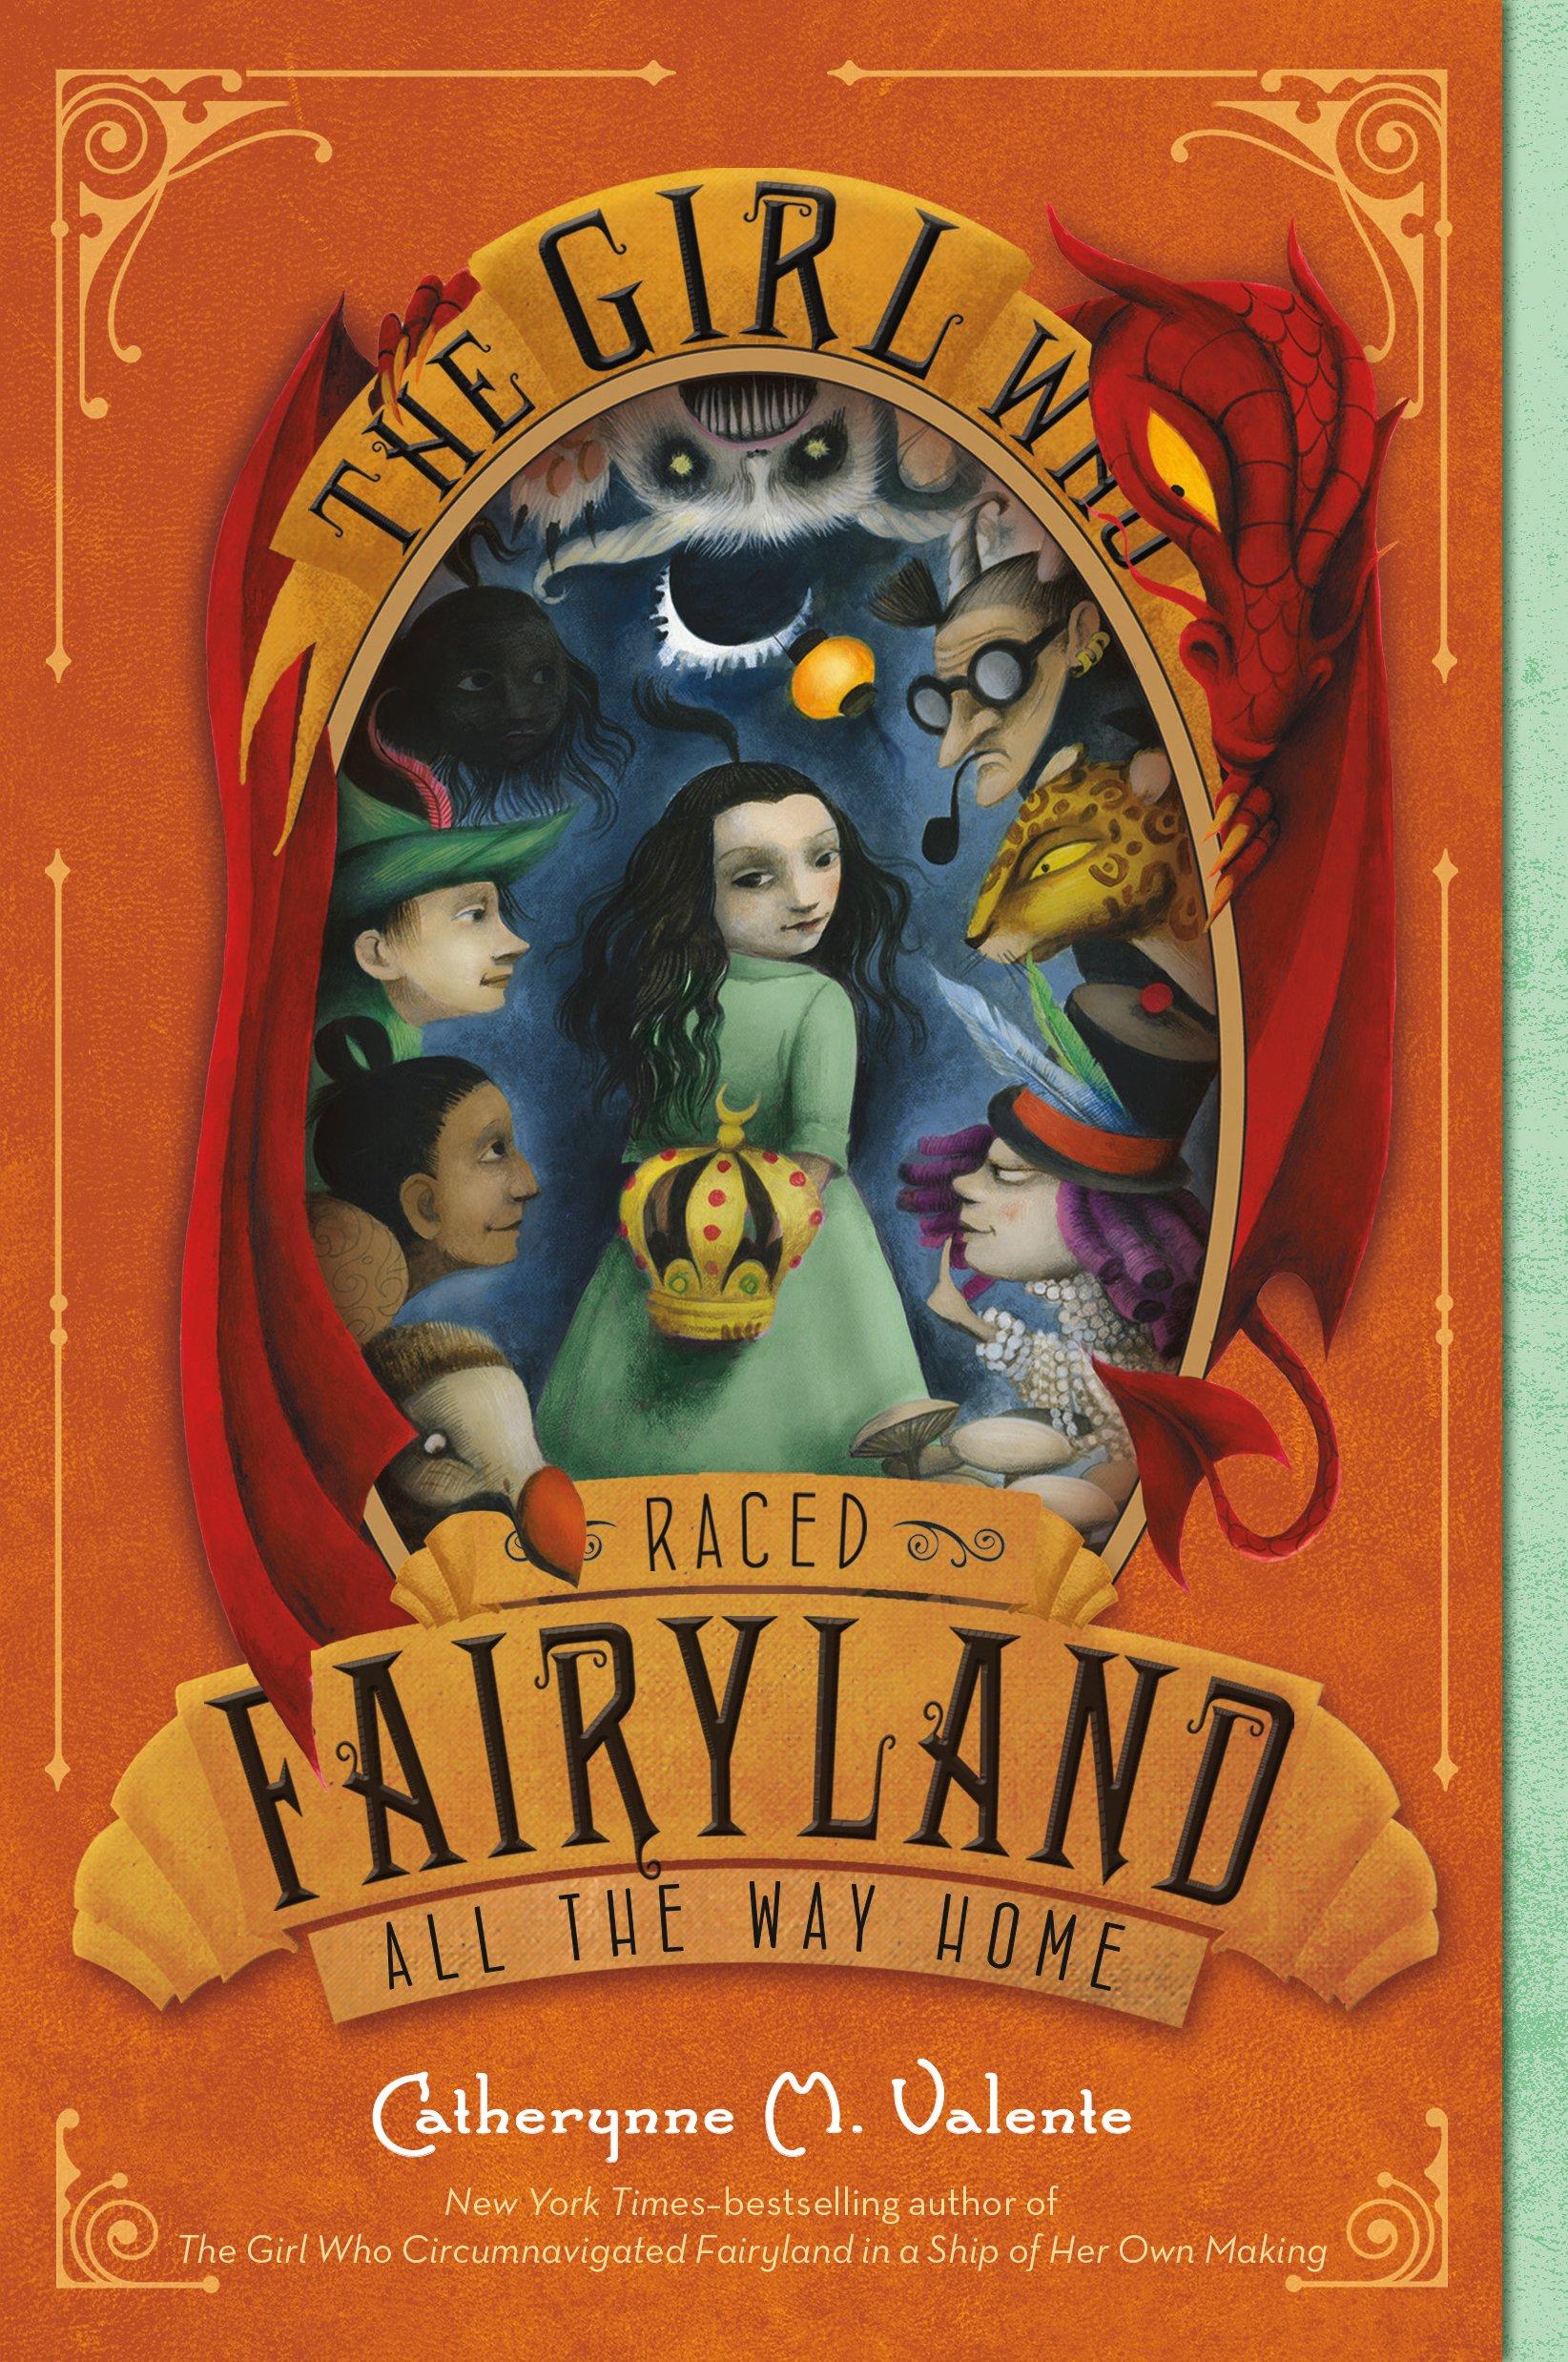 The Girl Who Raced Fairyland All Way Home Catherynne M Valente Ana Juan 9781250104014 Amazon Books